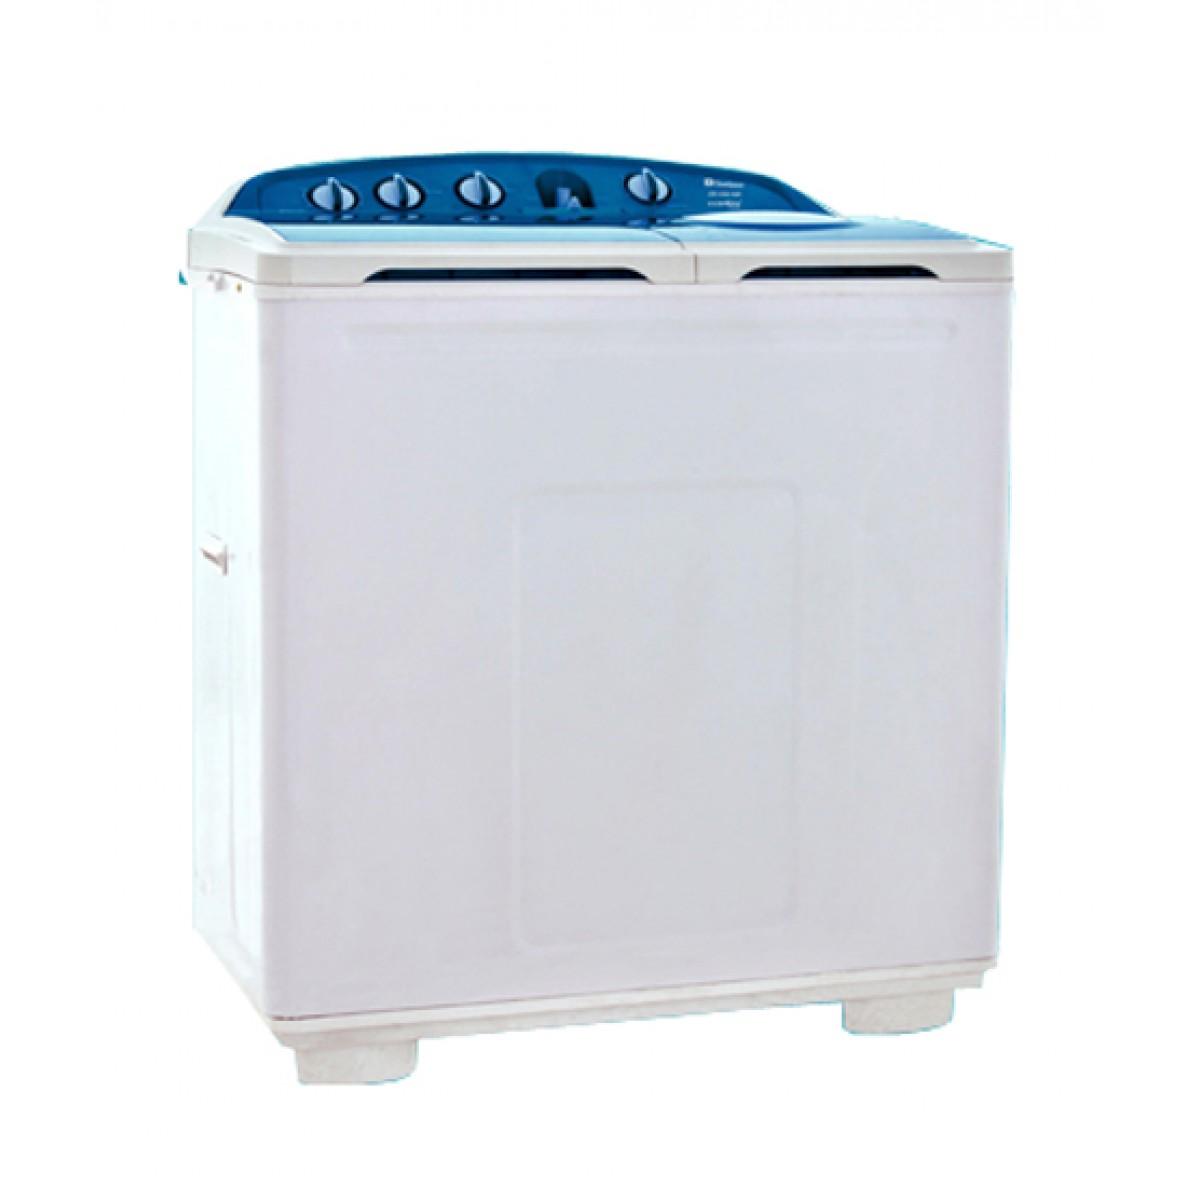 Dawlance Semi-Automatic Washing Machine DW-8500HZP